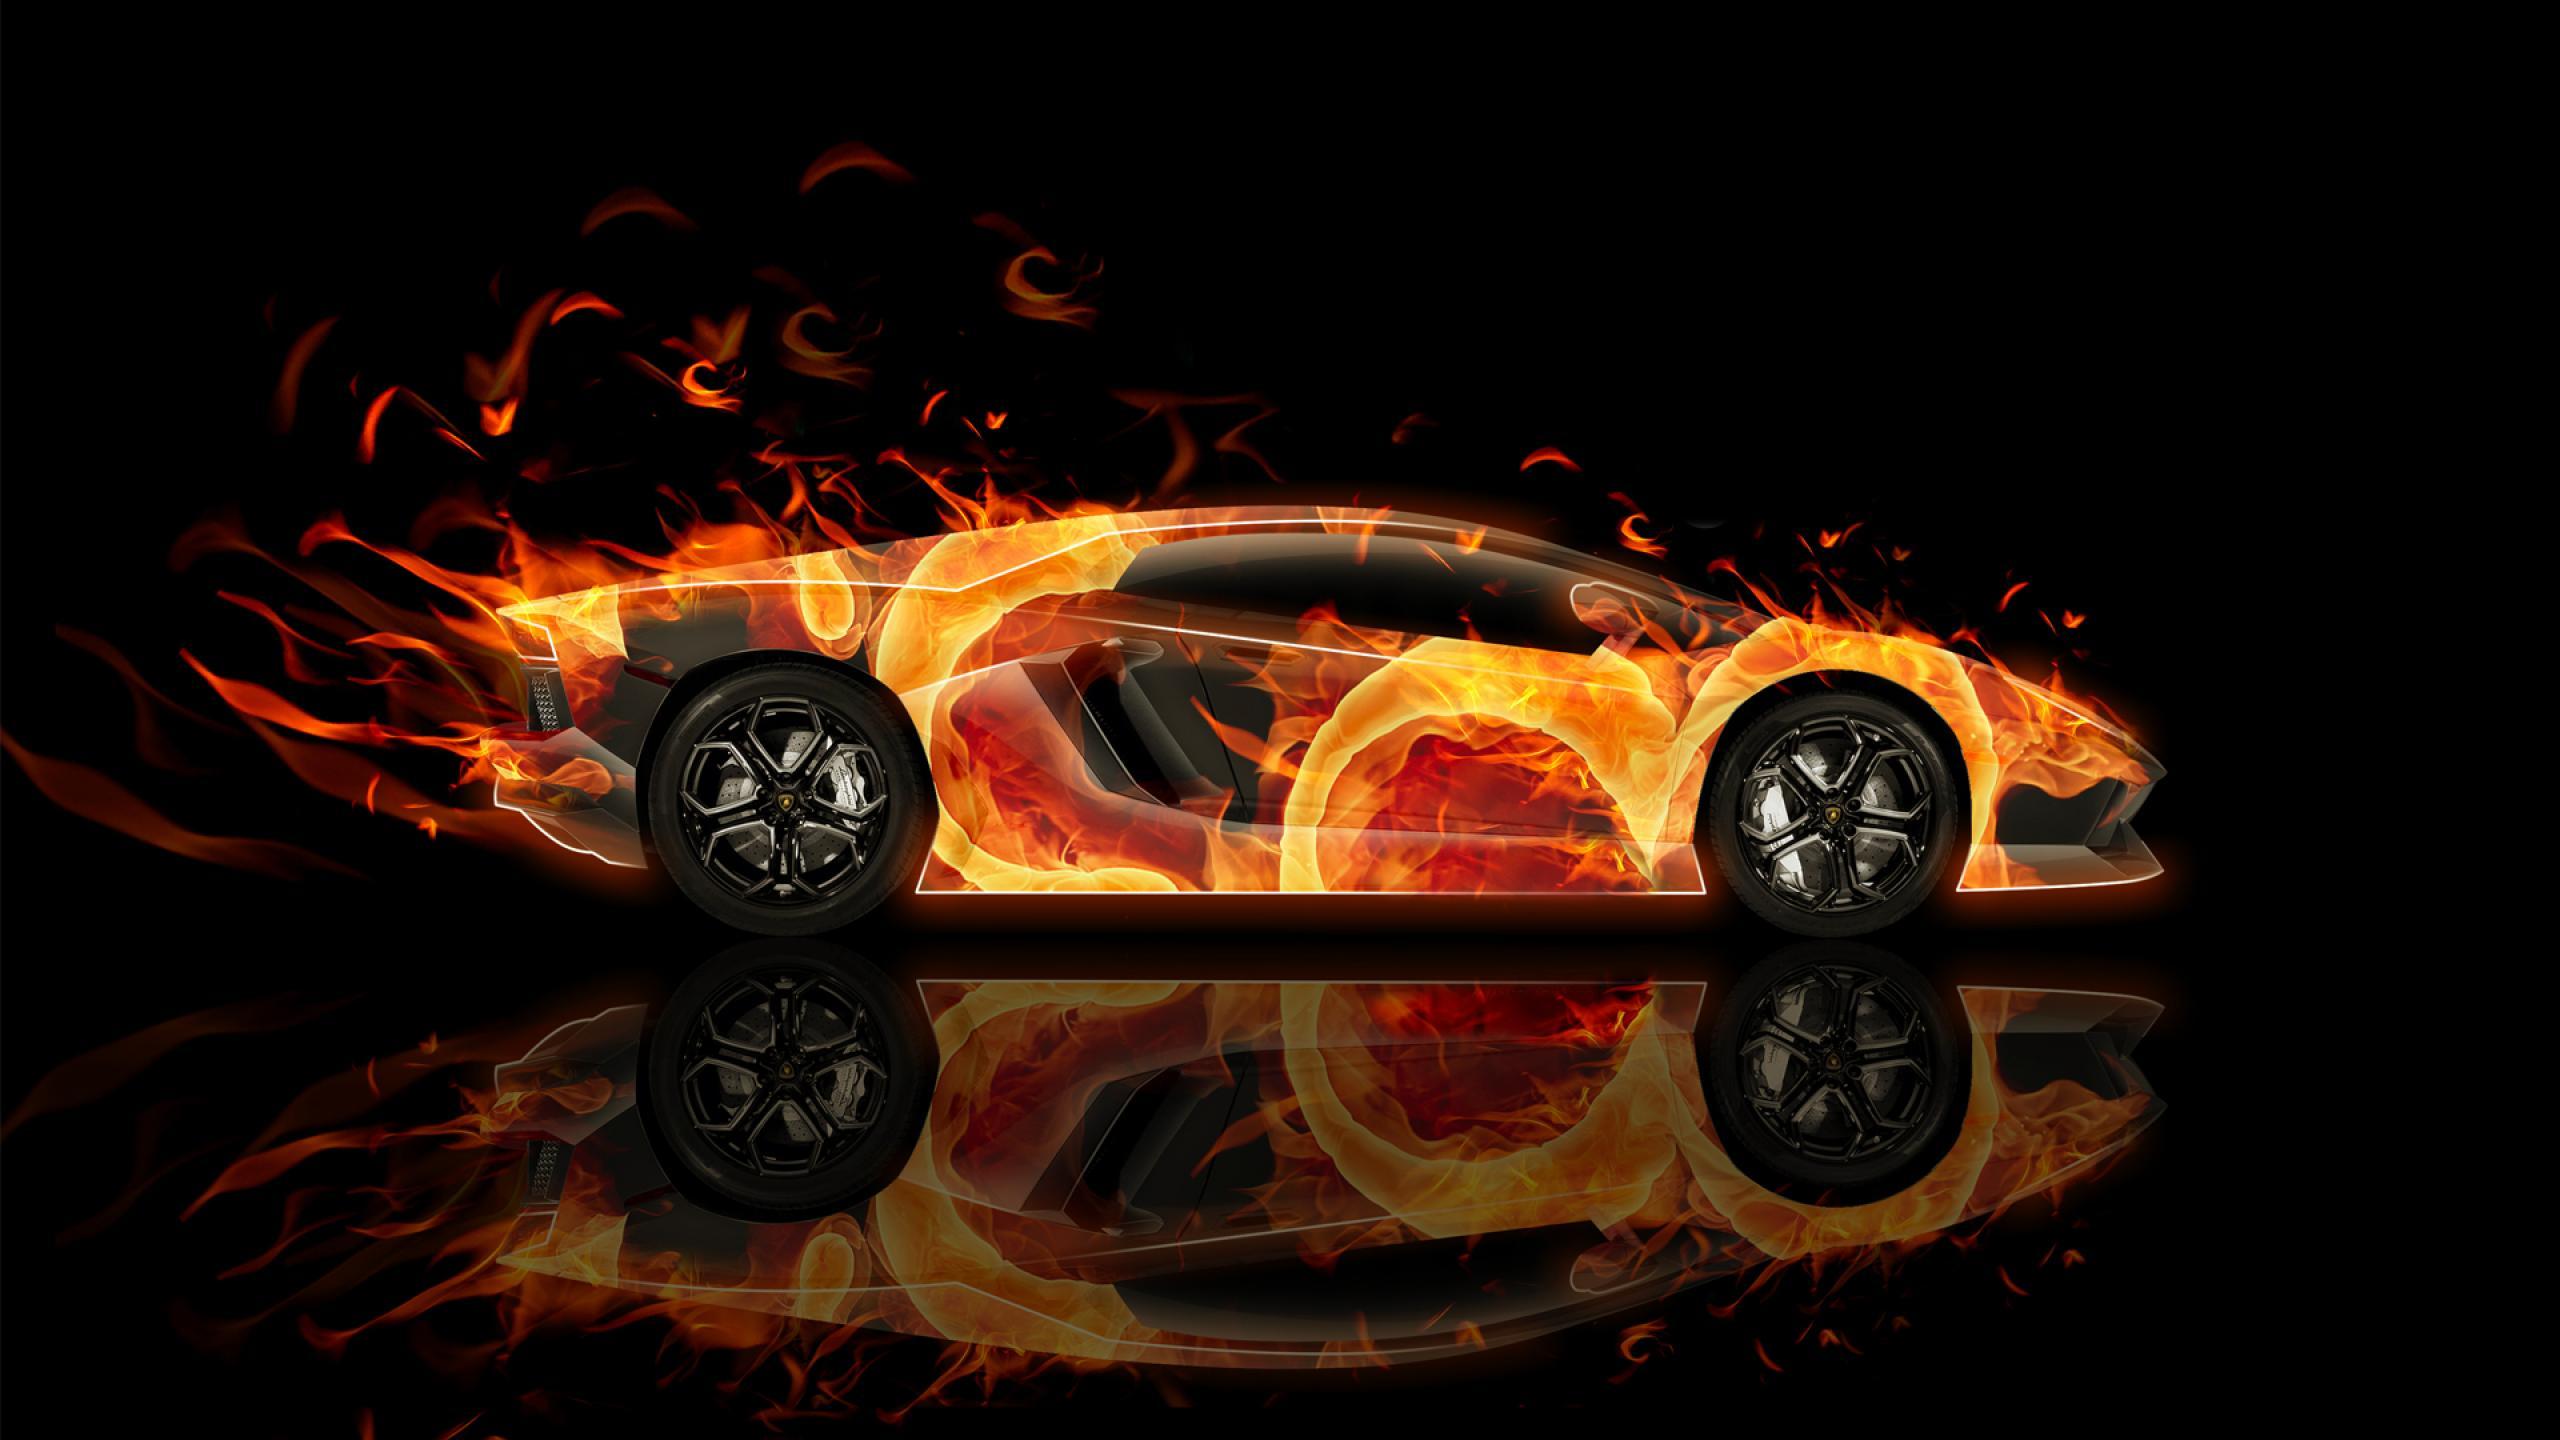 400 800 Hd Wallpaper Lamborghini Aventador Fire Hd Wallpaper